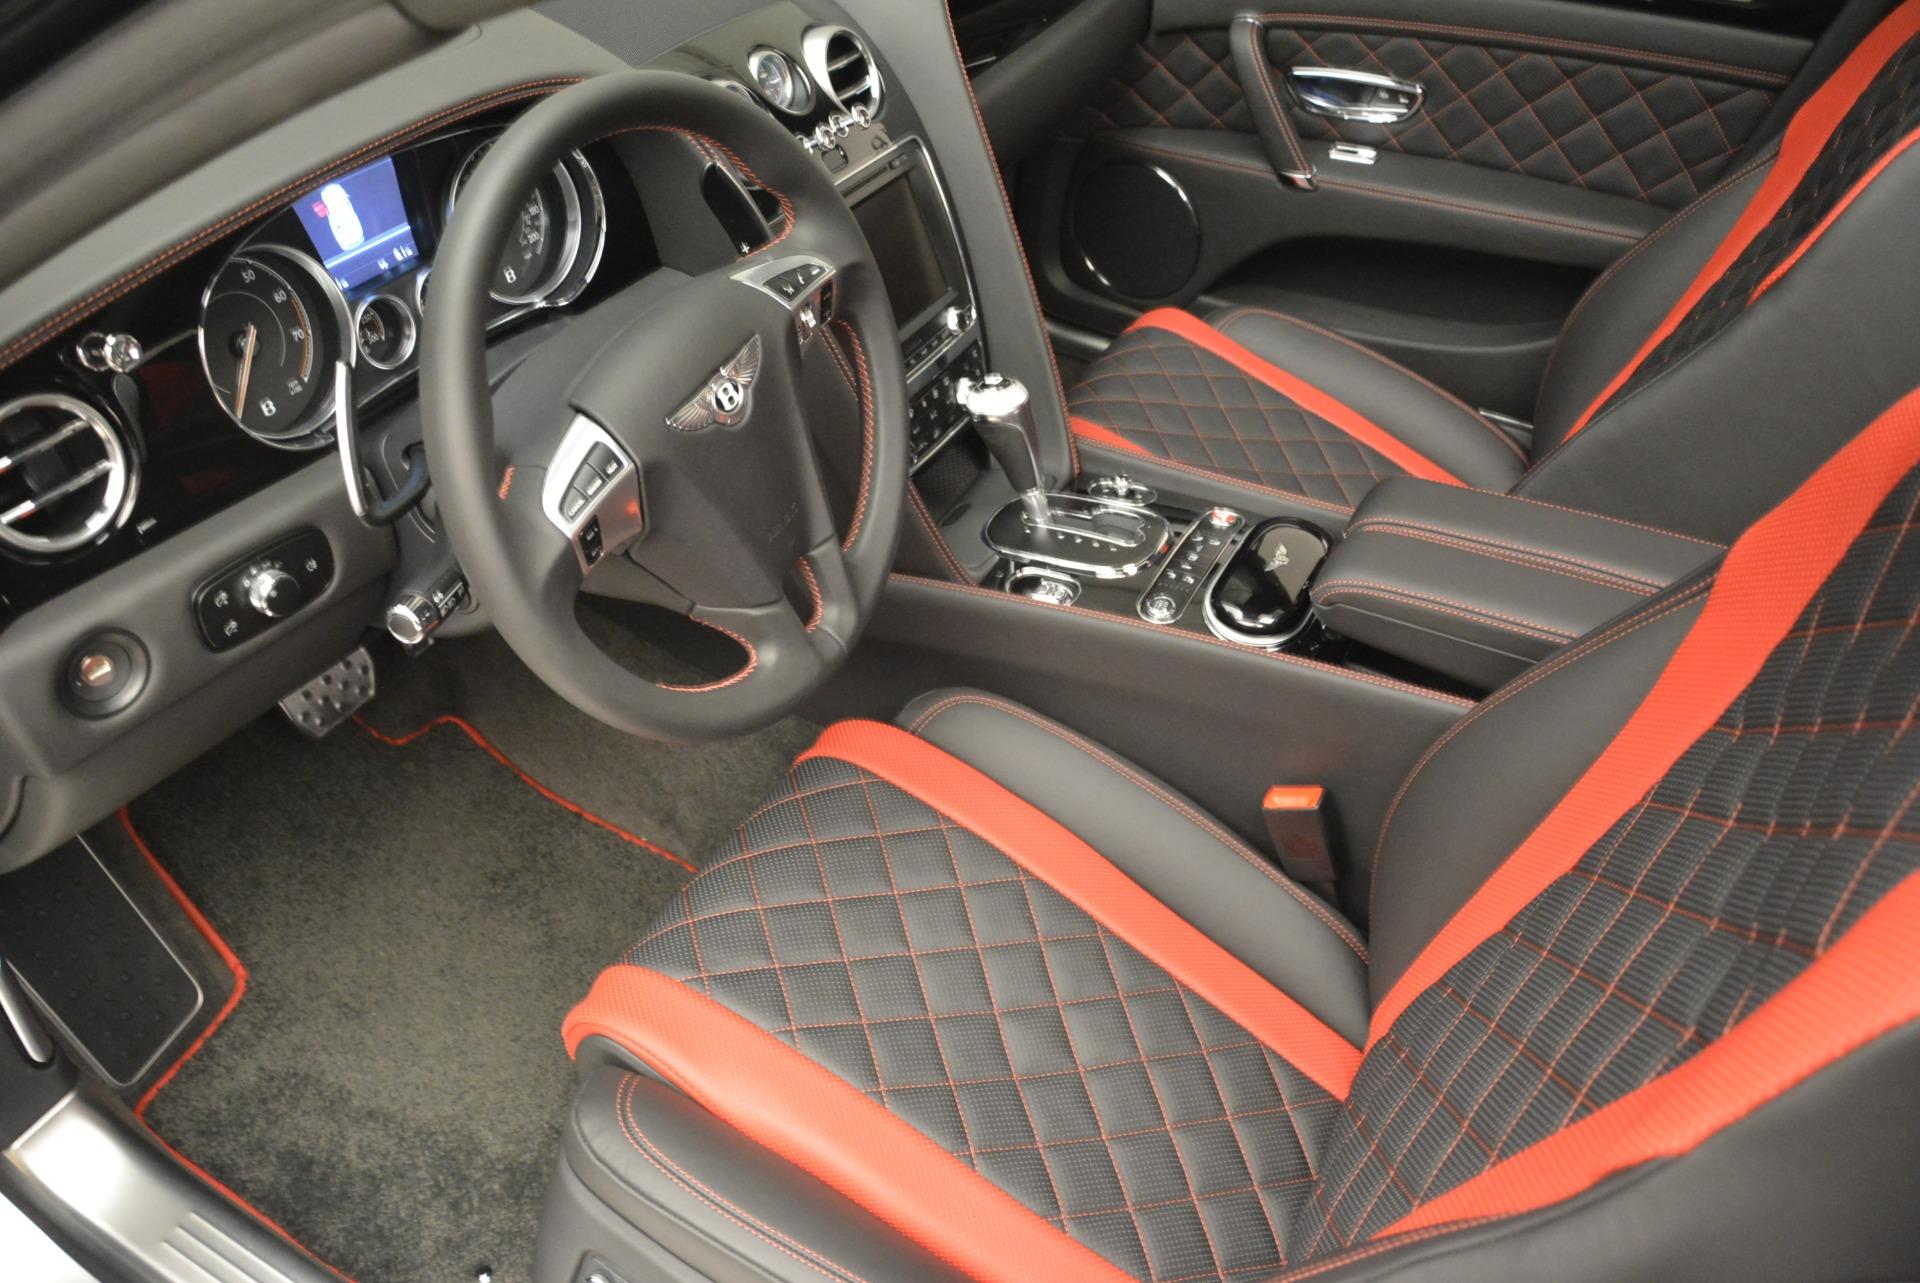 New 2018 Bentley Flying Spur V8 S Black Edition For Sale In Westport, CT 2073_p15